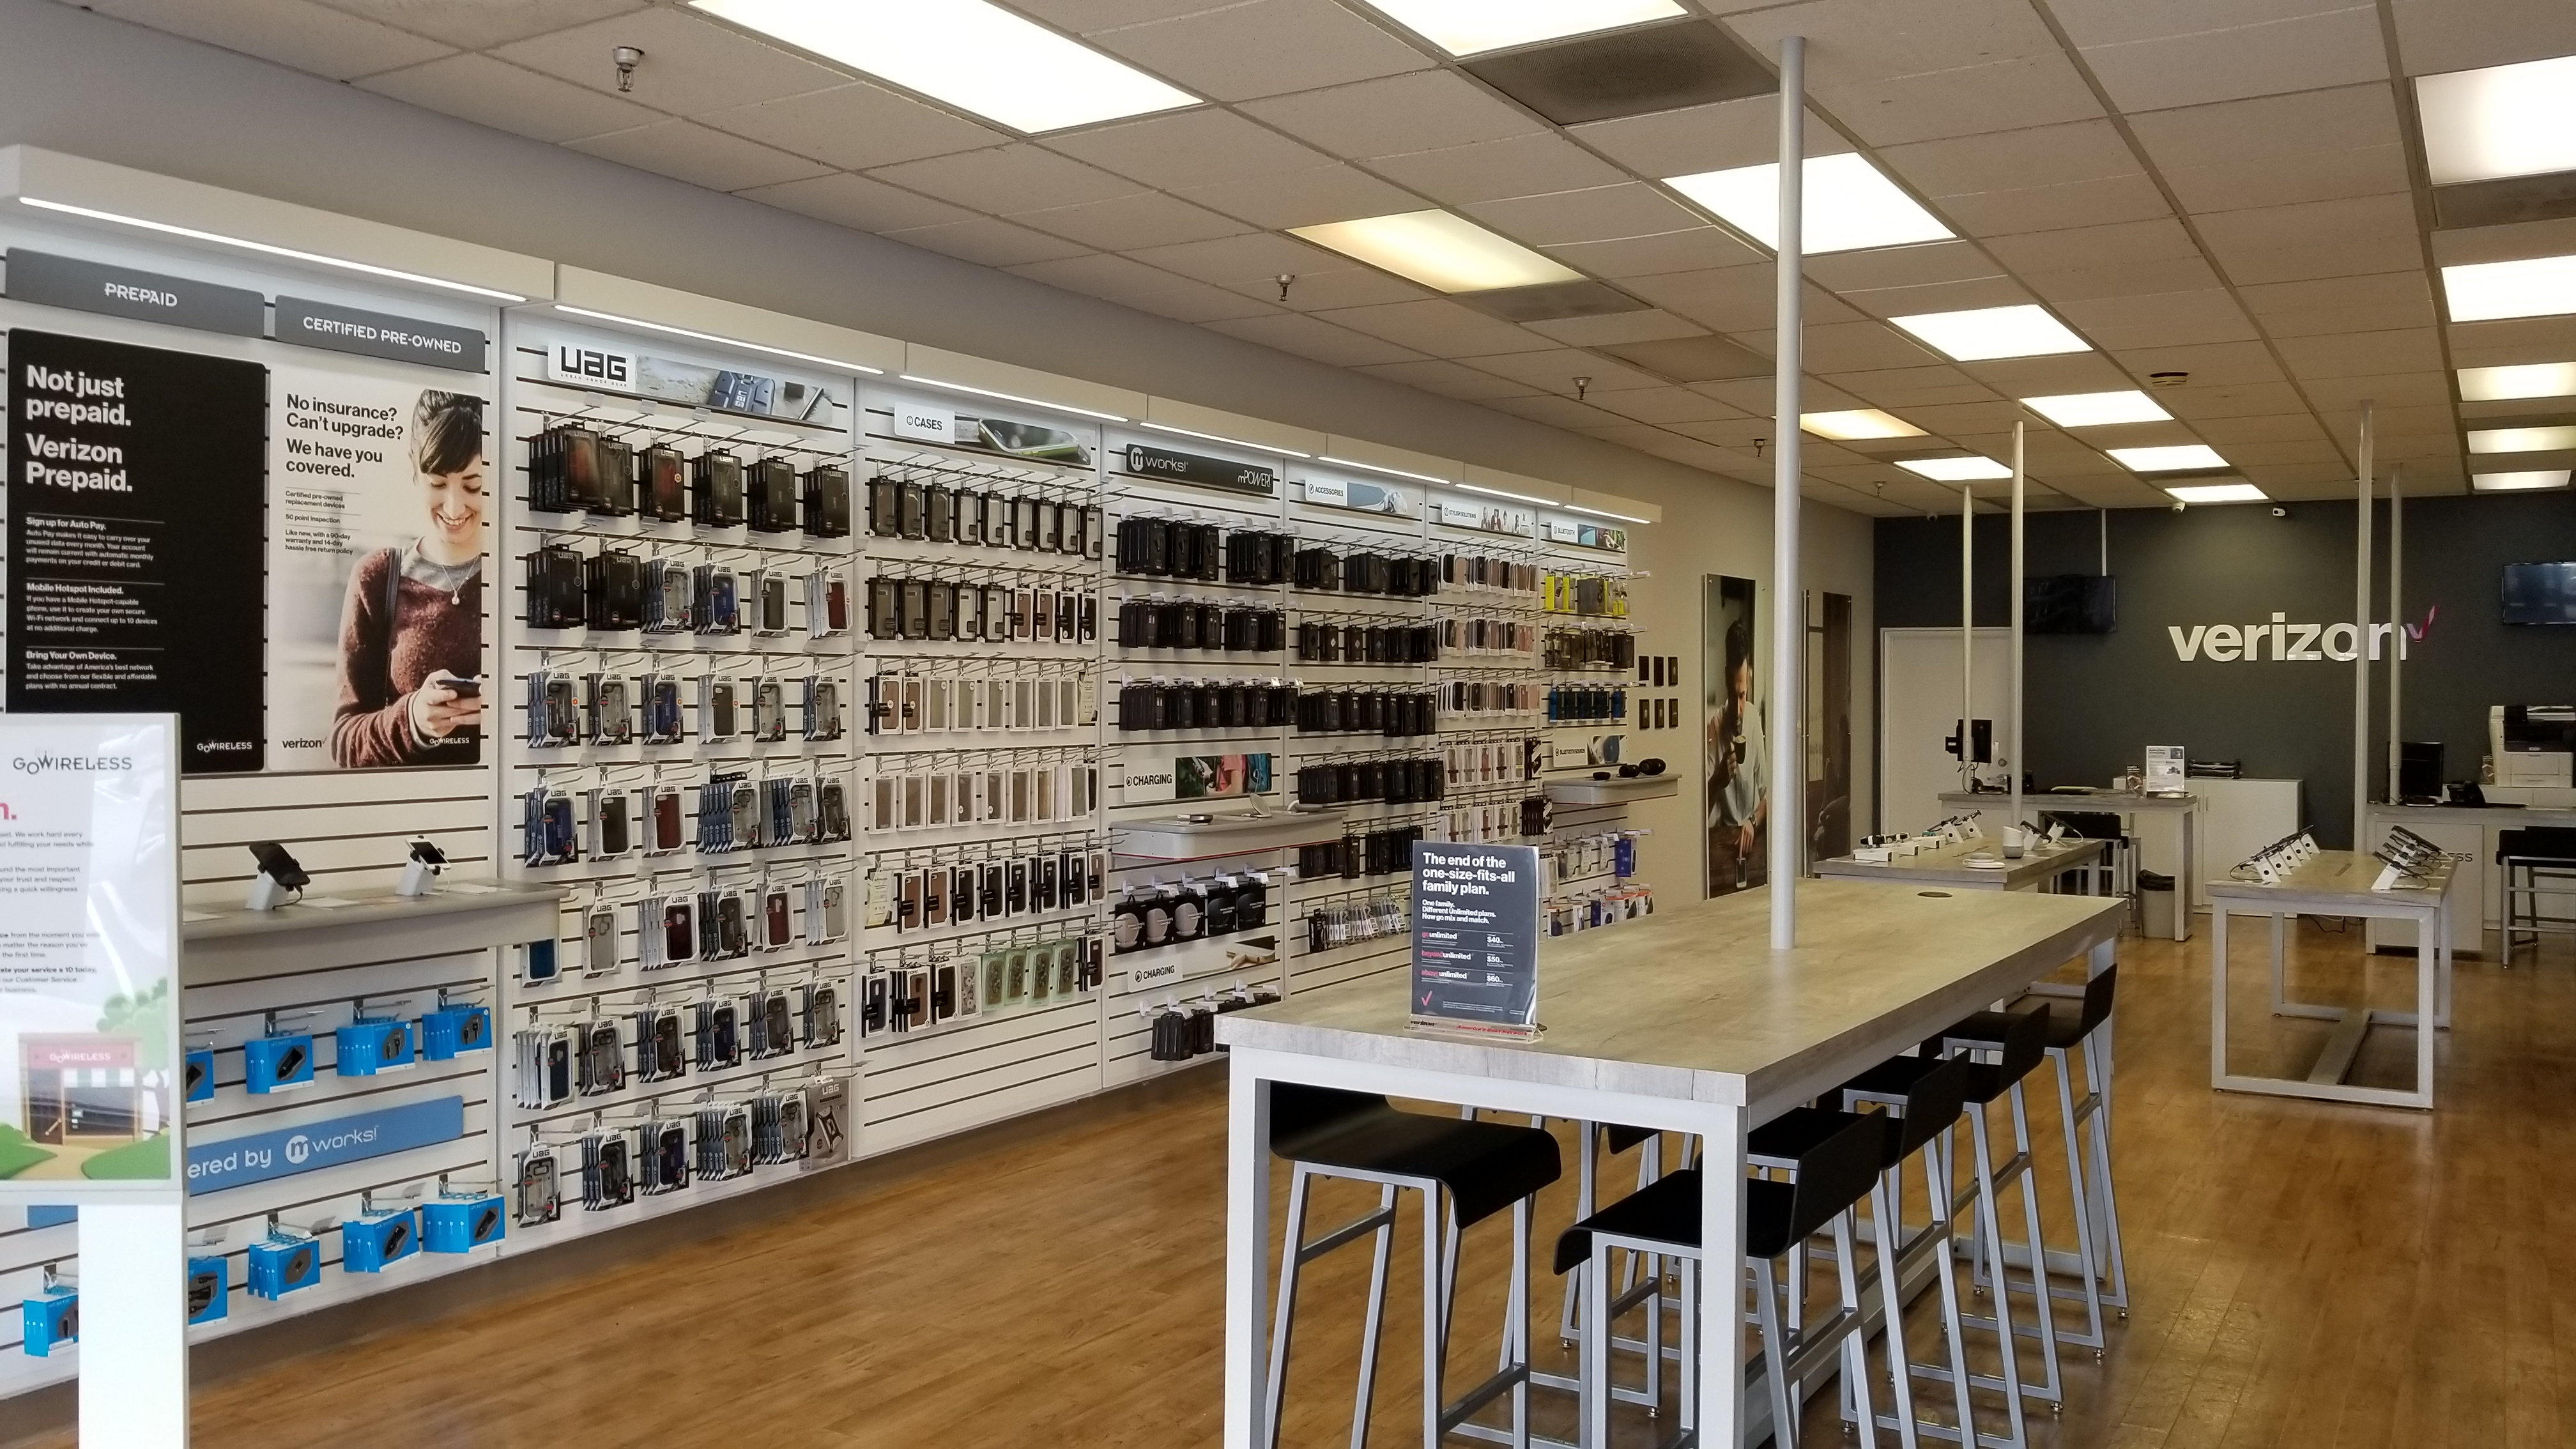 Verizon Authorized Retailer – GoWireless - CLOSED image 6